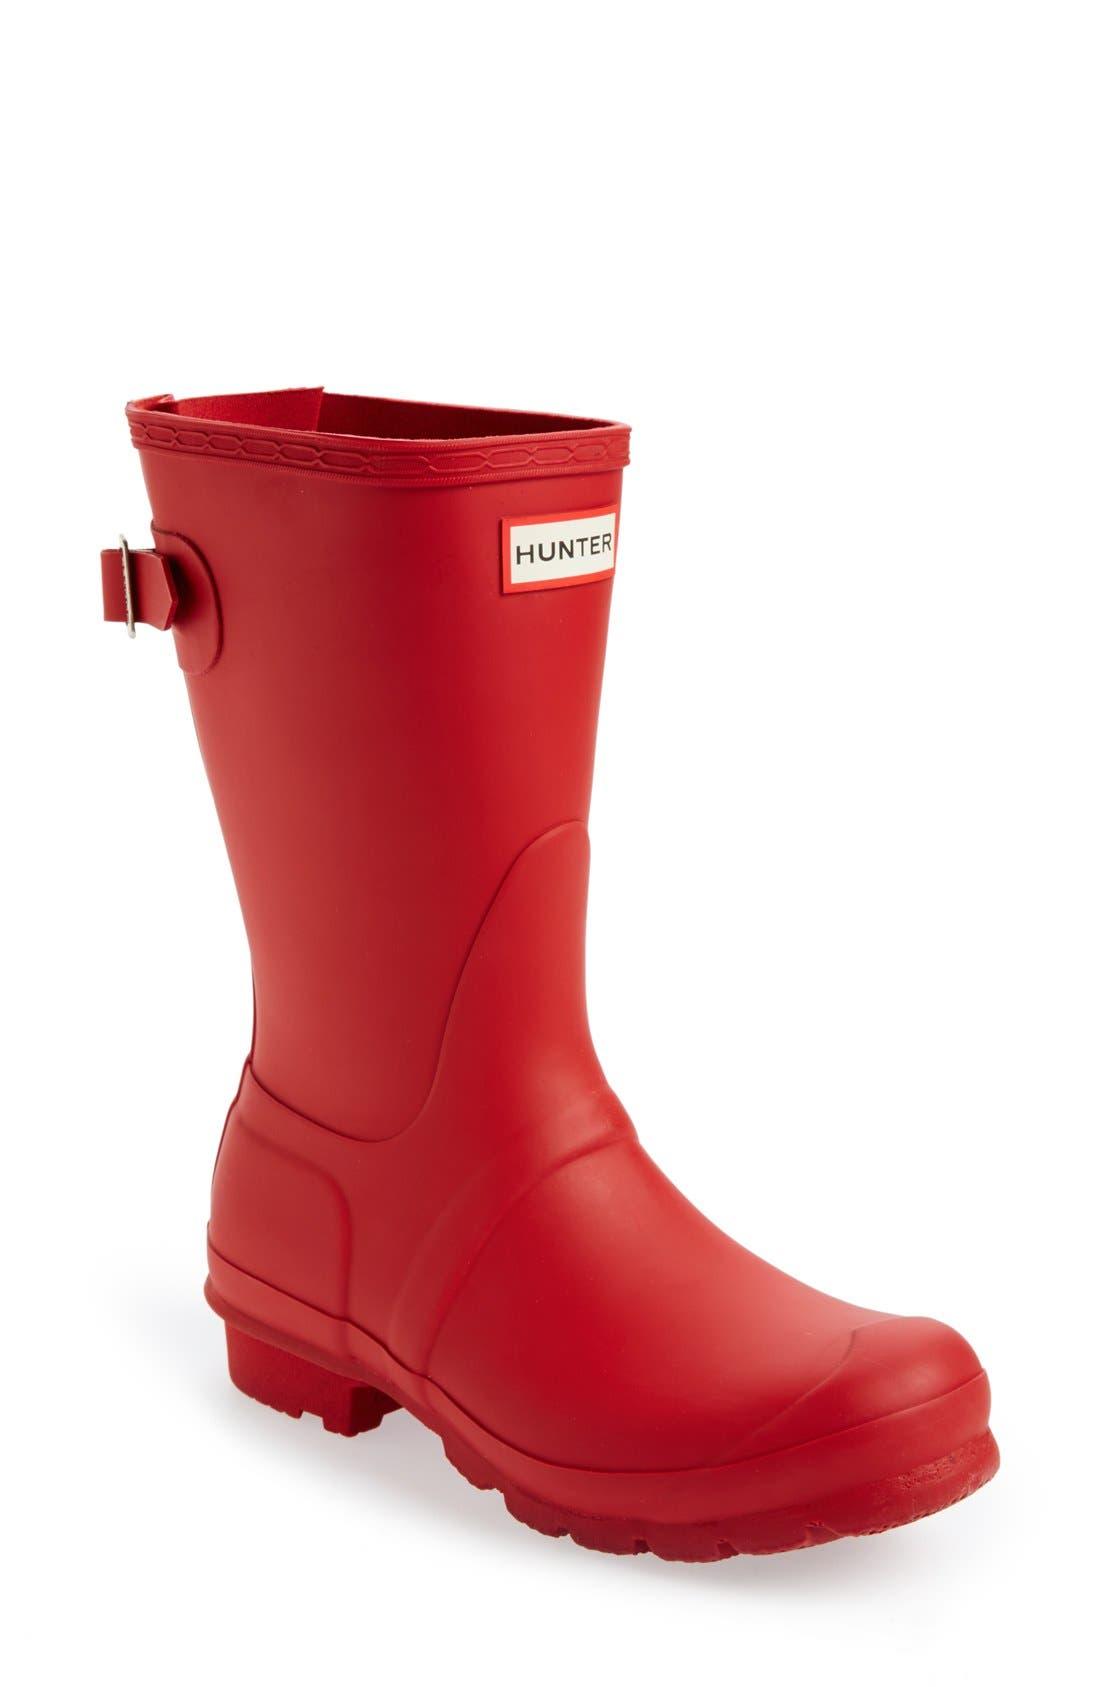 Main Image - Hunter Original Short Back Adjustable Rain Boot (Women)